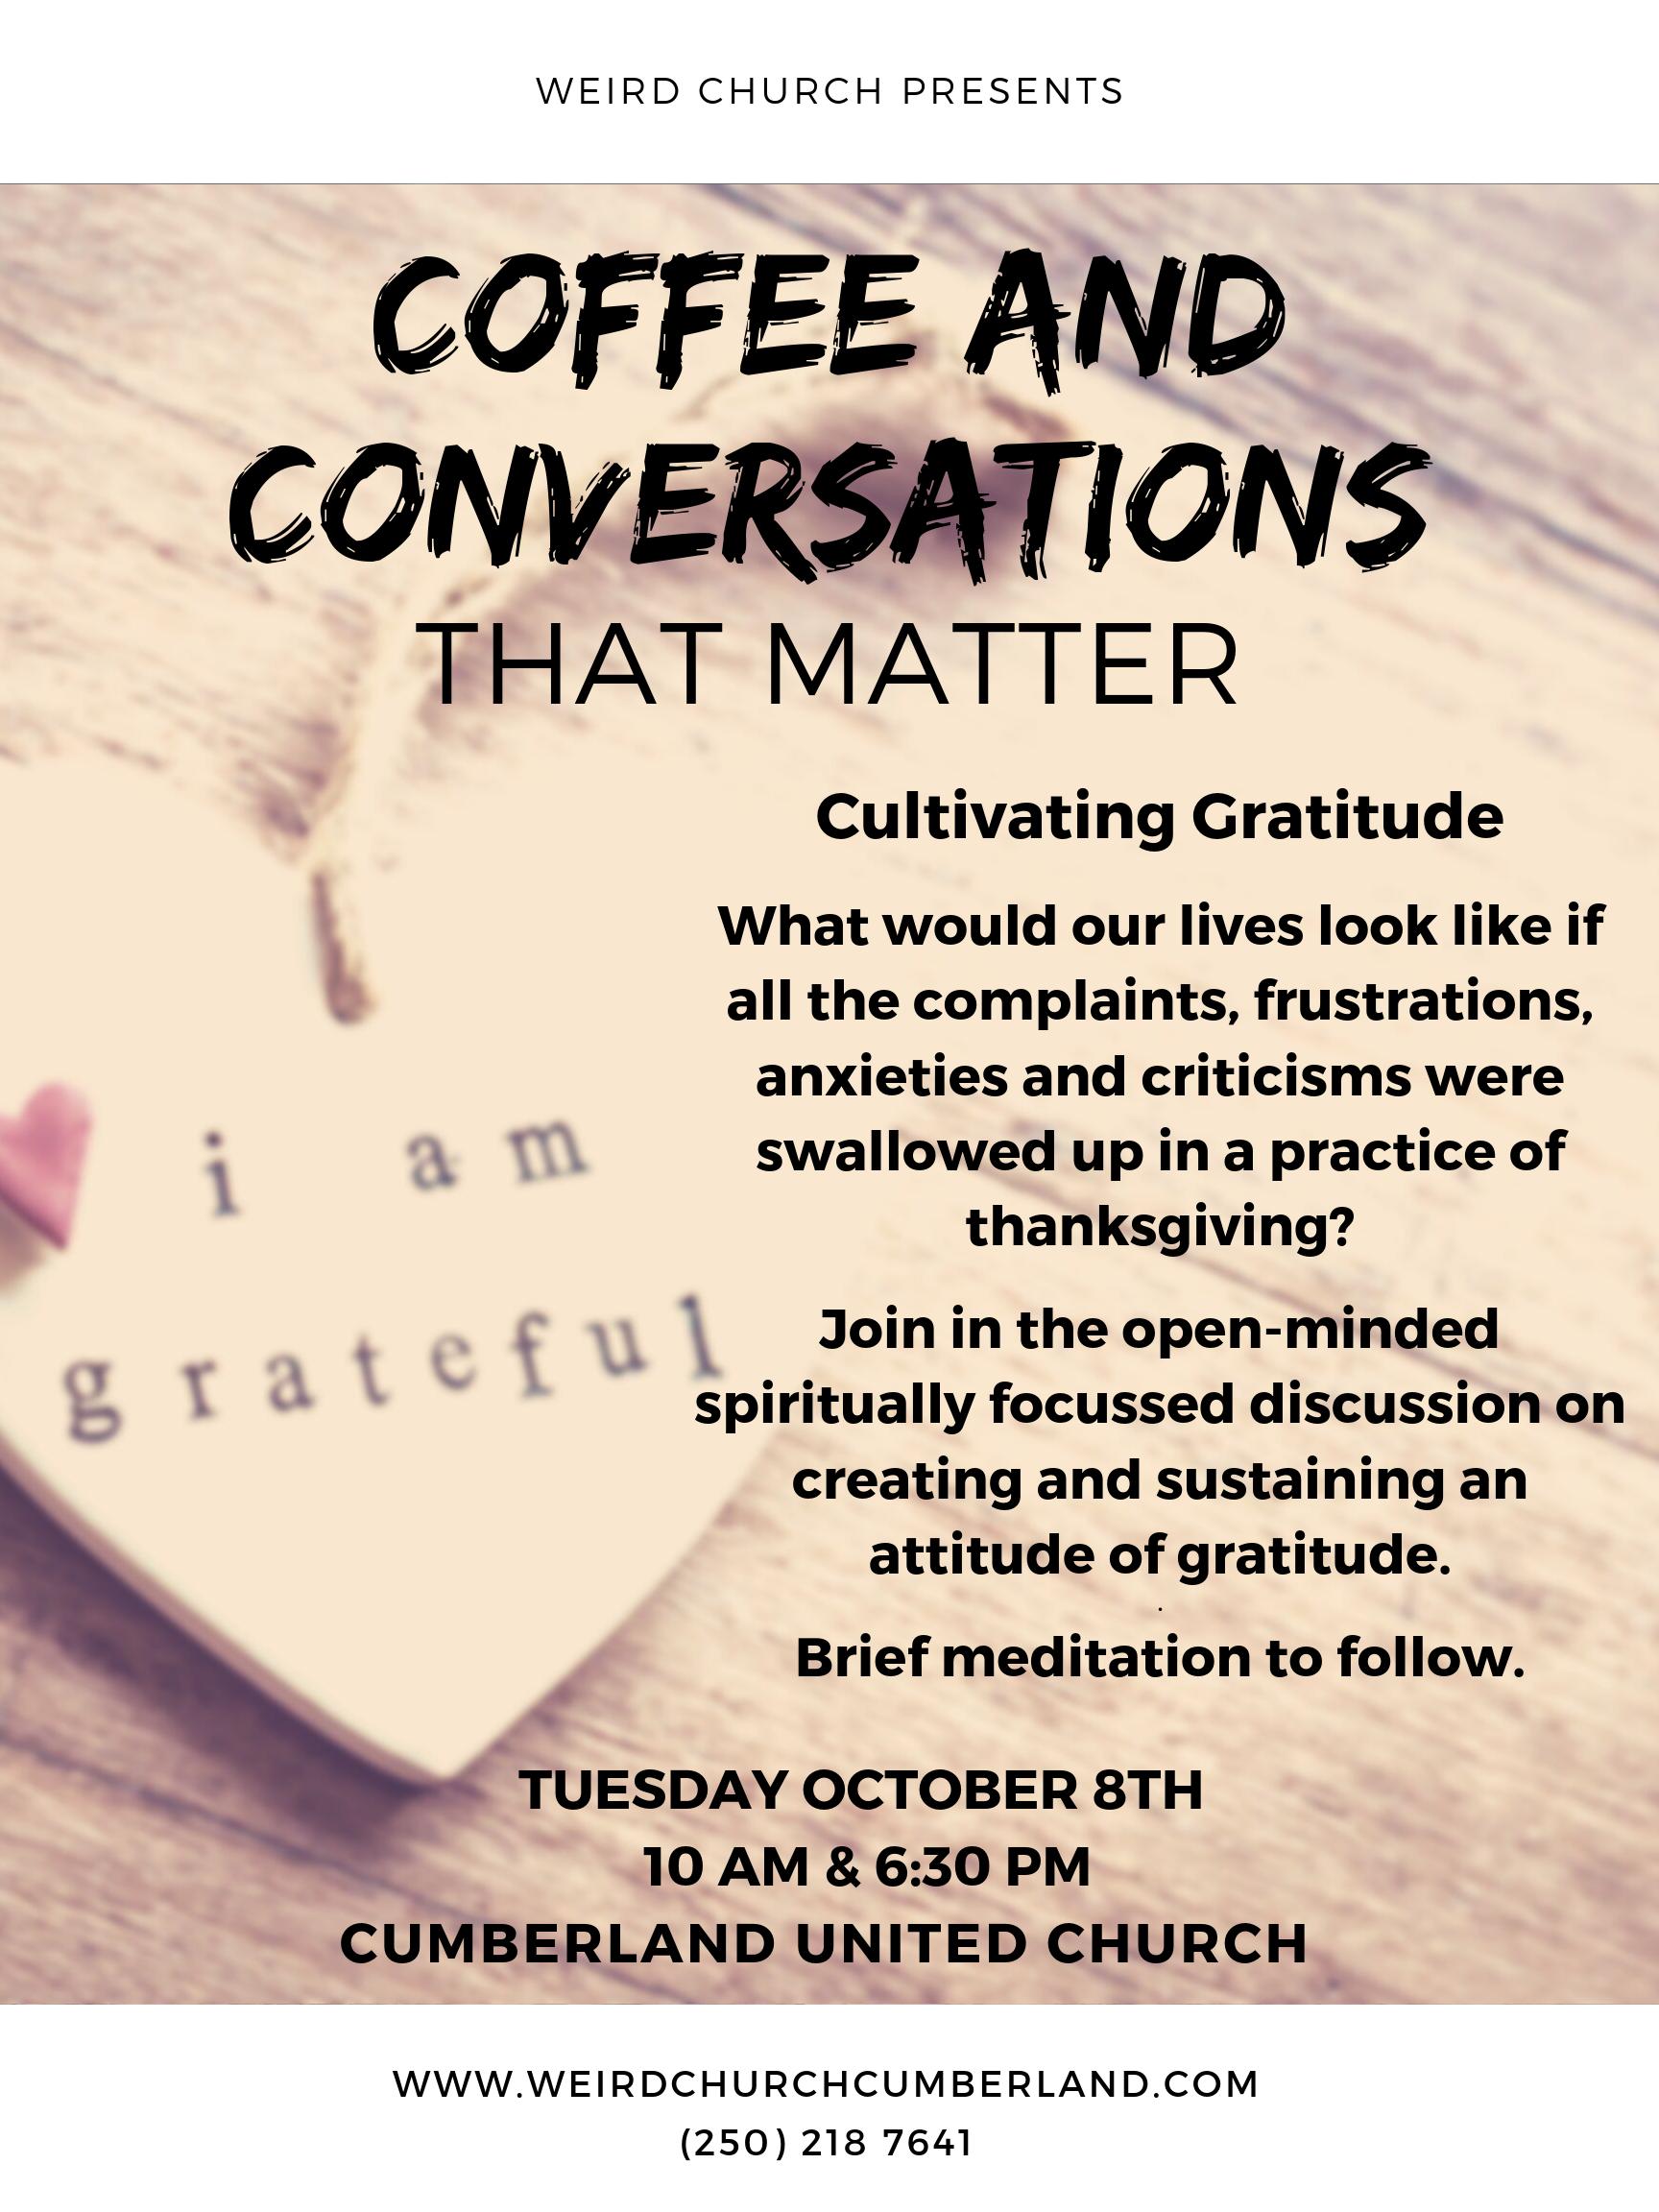 C&C Oct 2019 Cultivating Gratitude.png